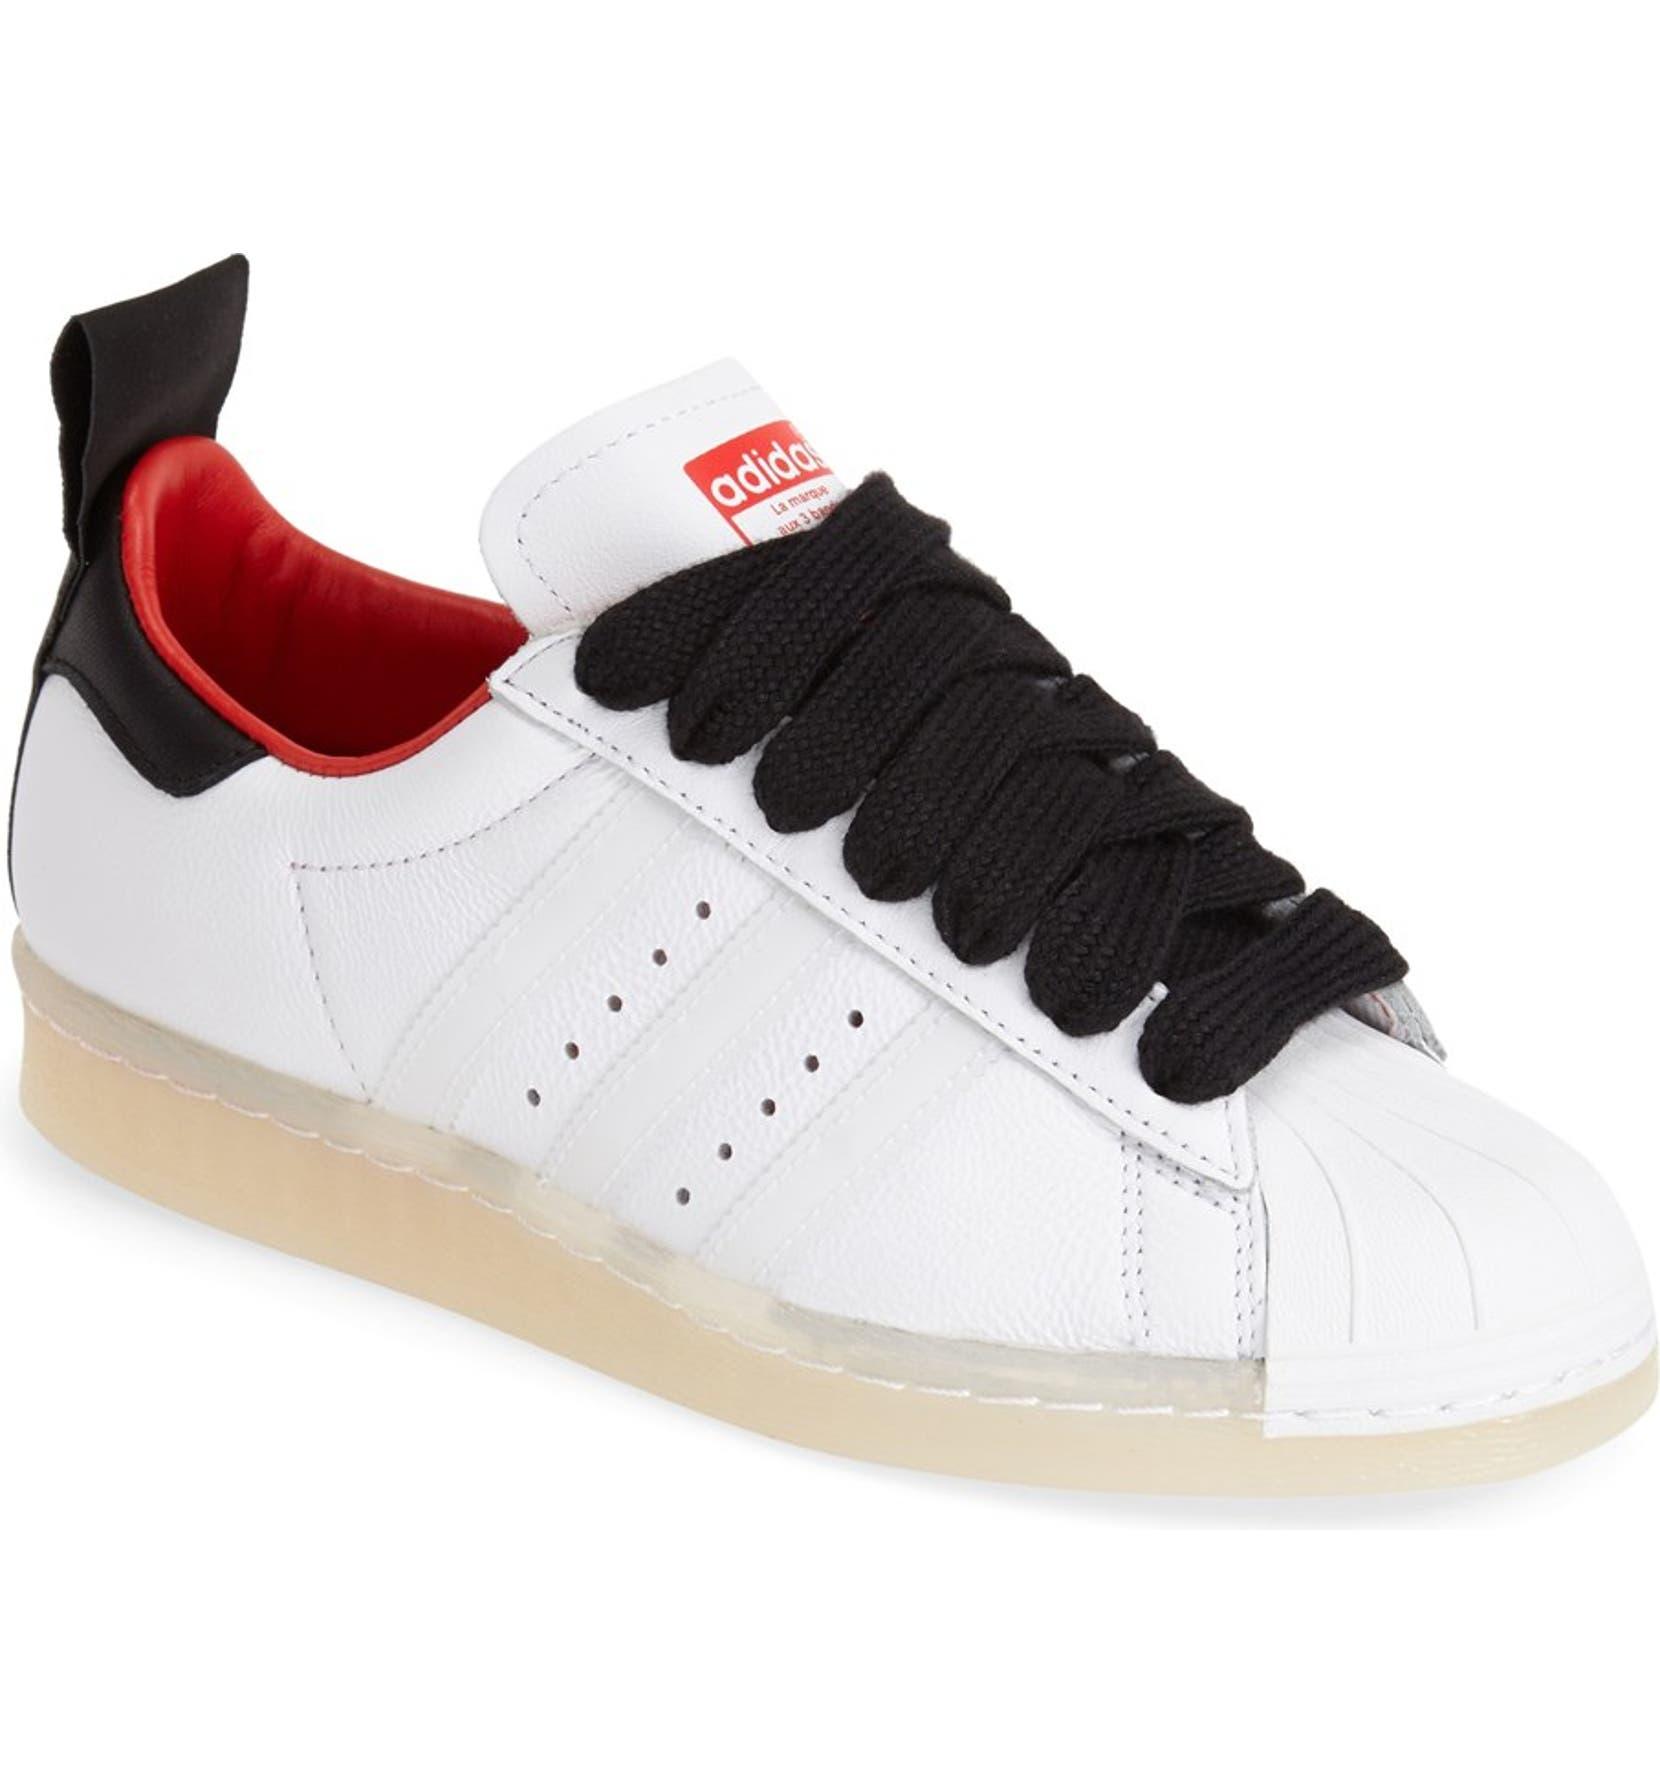 4e8356b4e69 Topshop for adidas Originals  Superstar 80s  Leather Sneaker (Women ...